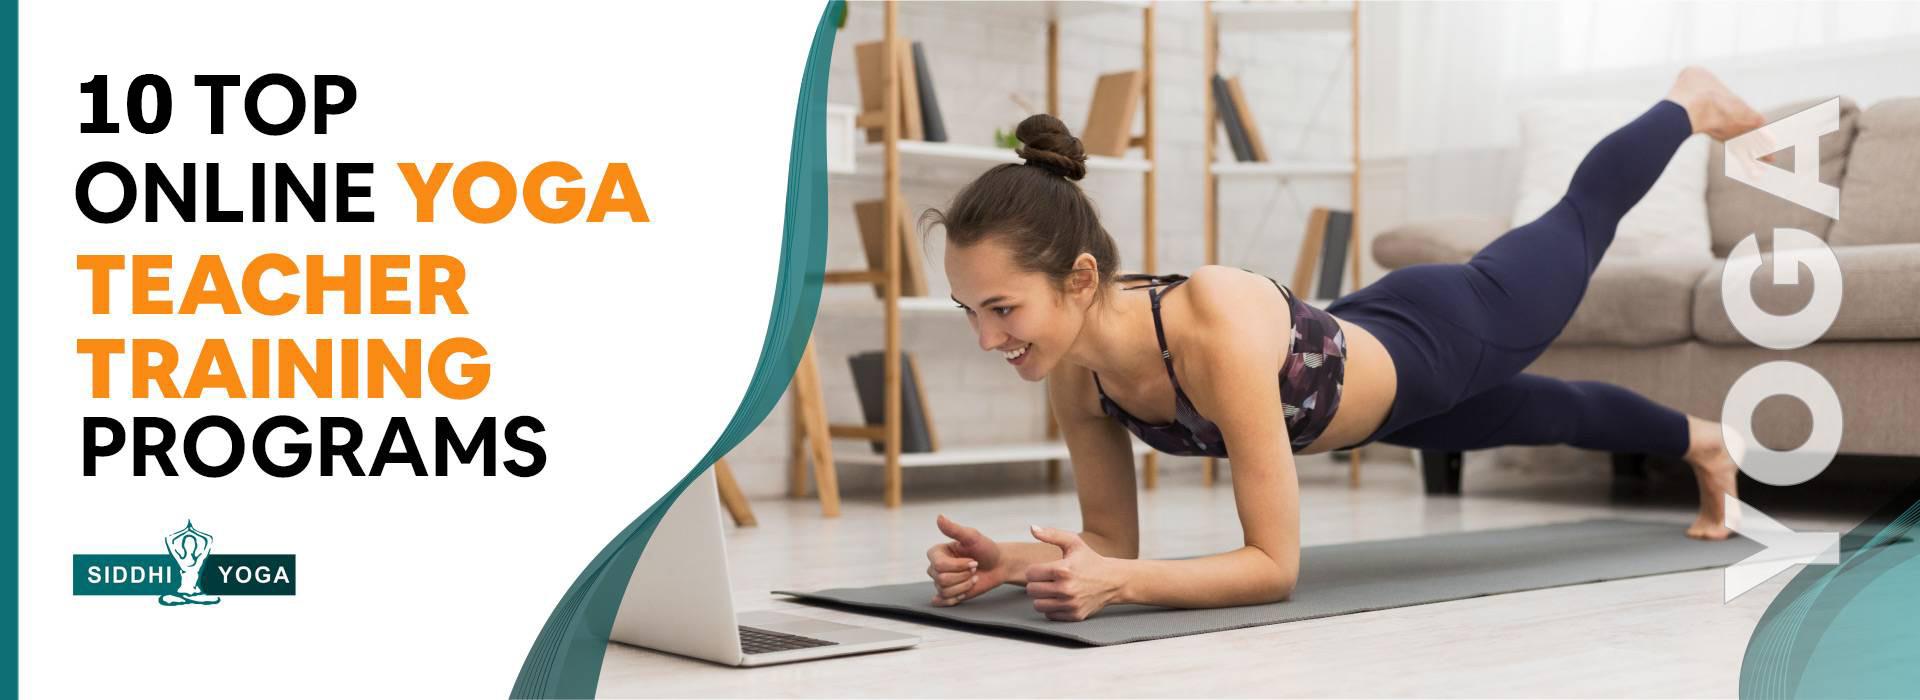 top-10-online-yoga-teacher-training-2020